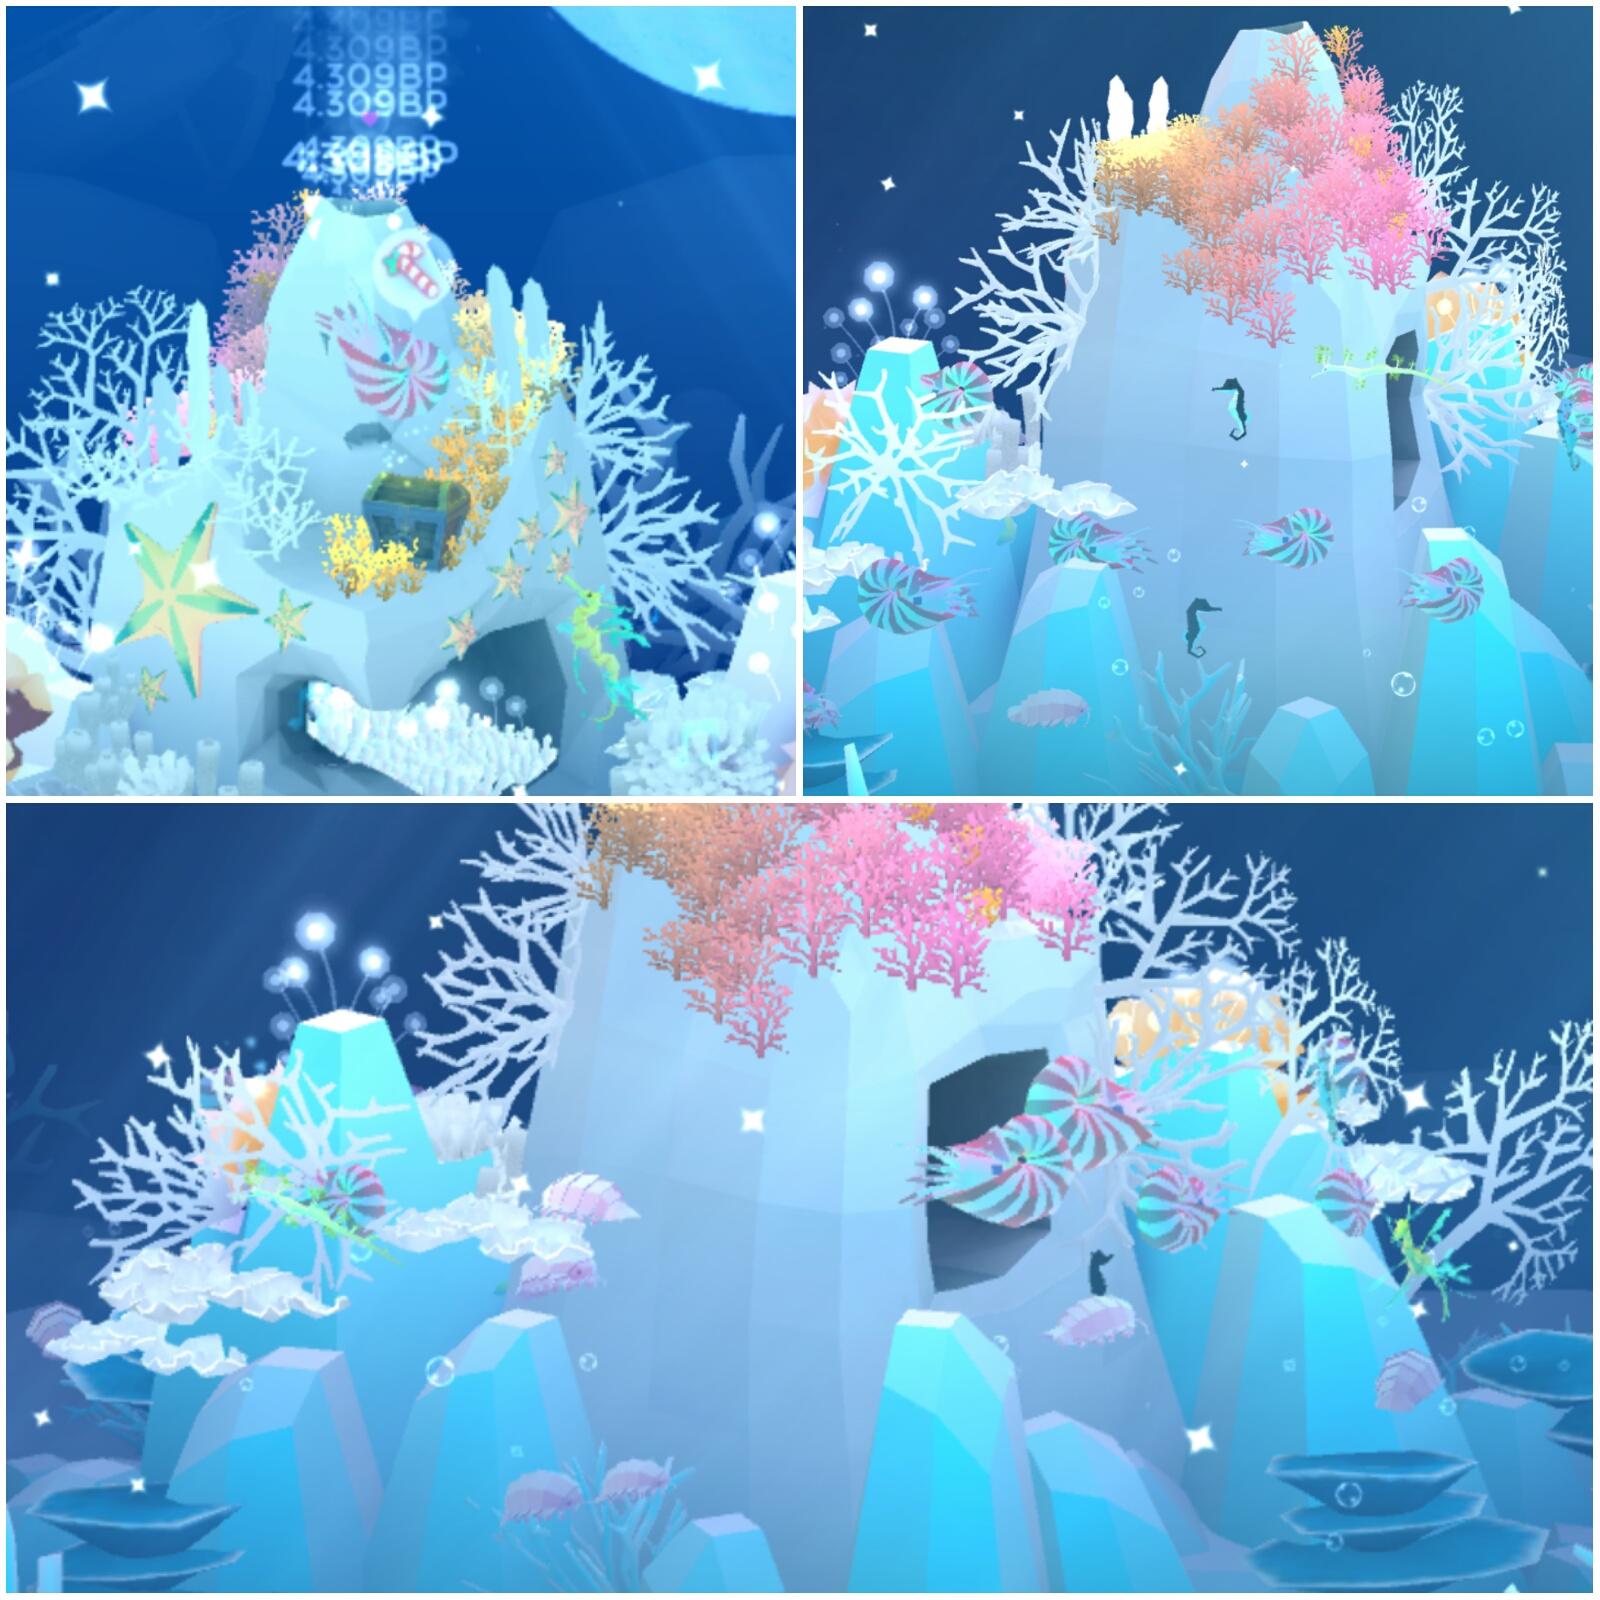 【AbyssRium】アビスリウム - タップで育つ水族館 9匹目 [無断転載禁止]©2ch.net->画像>26枚